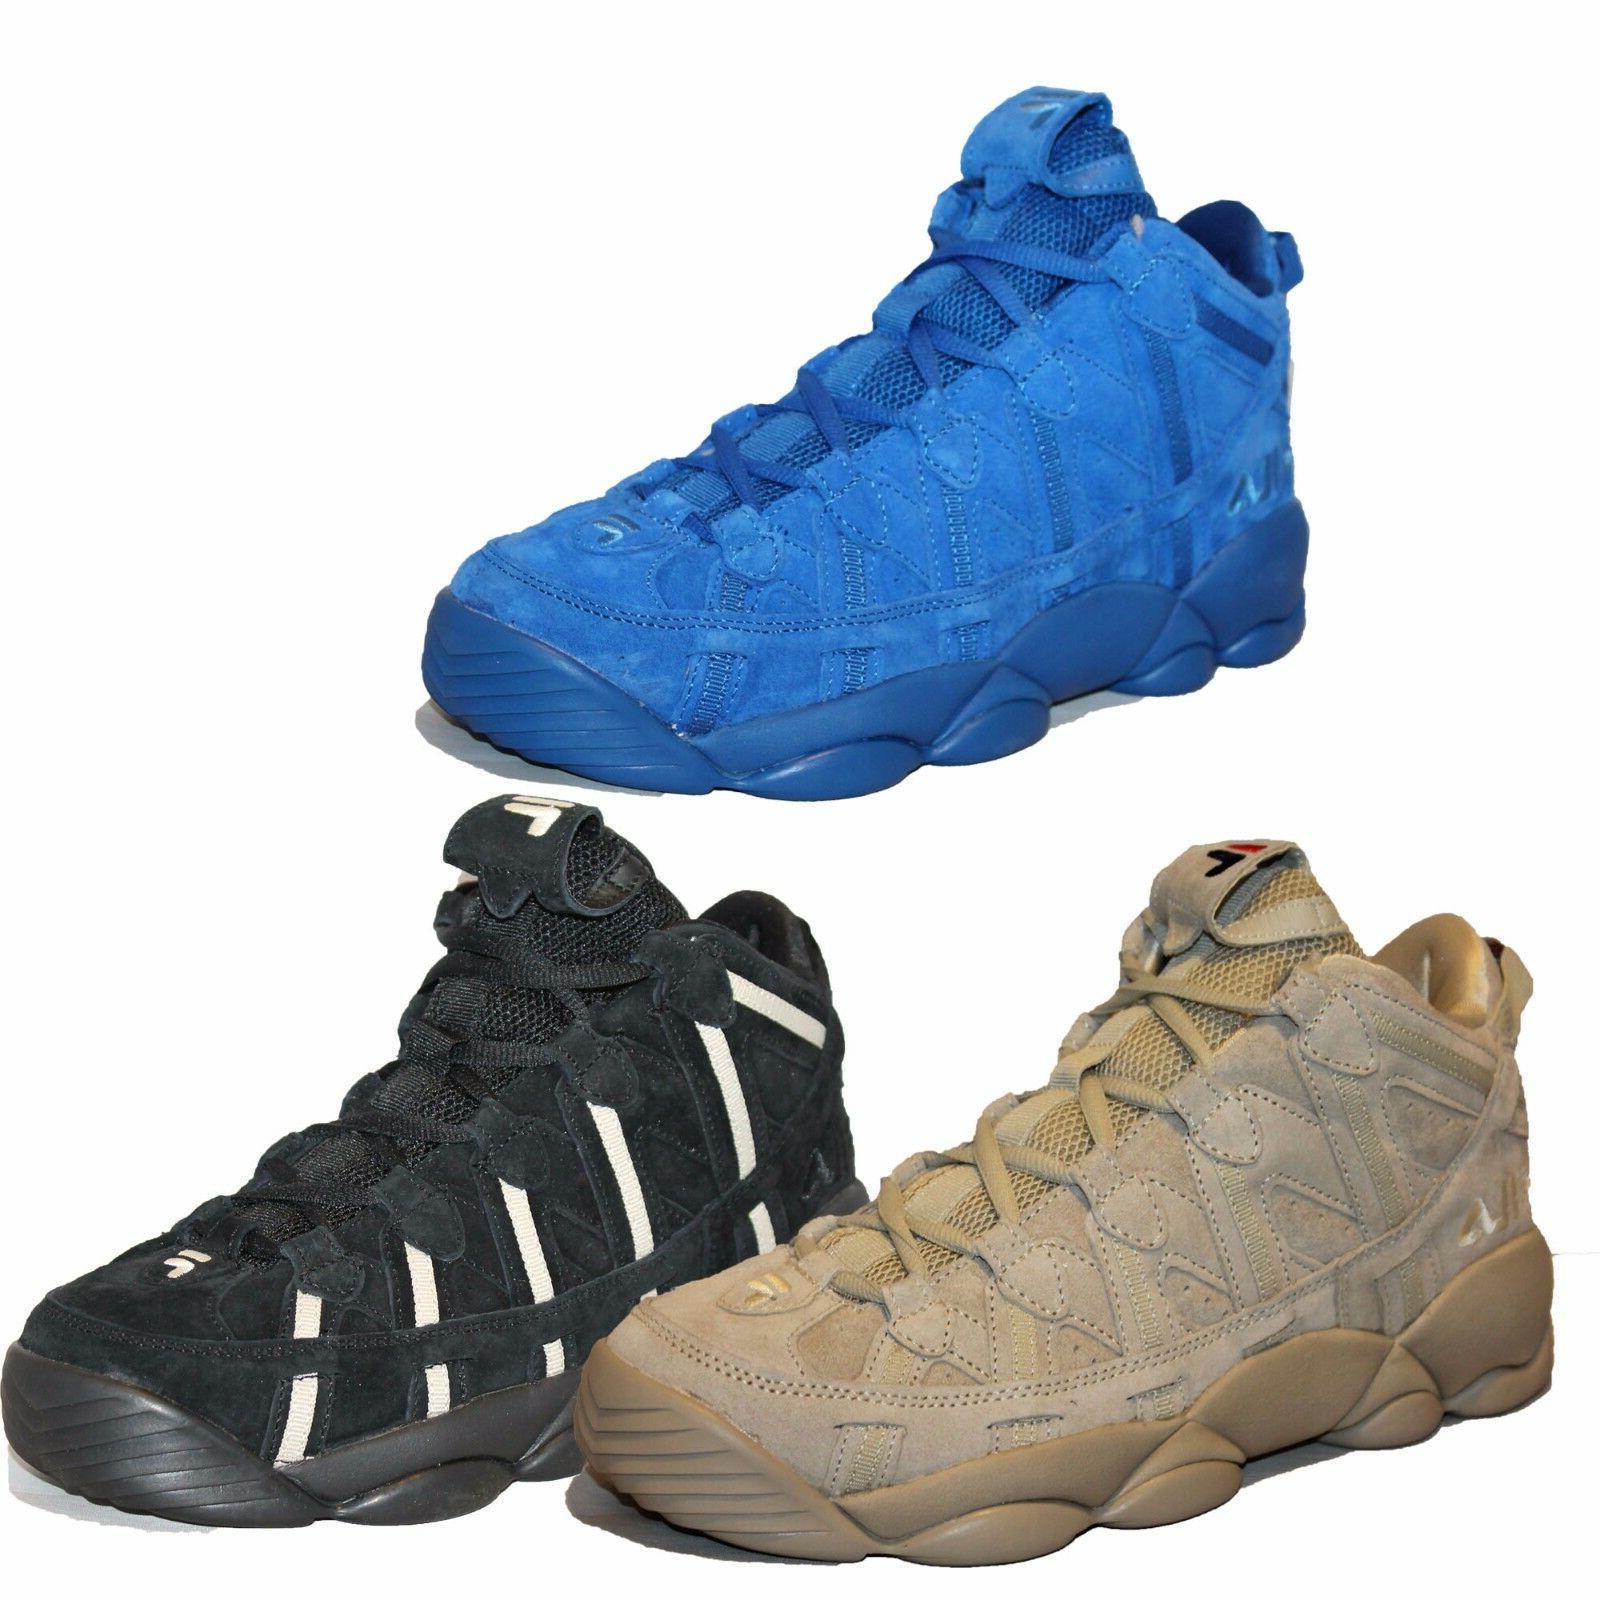 Mens FILA SPAGHETTI Jerry Stackhouse Retro Basketball Shoes 18647316b